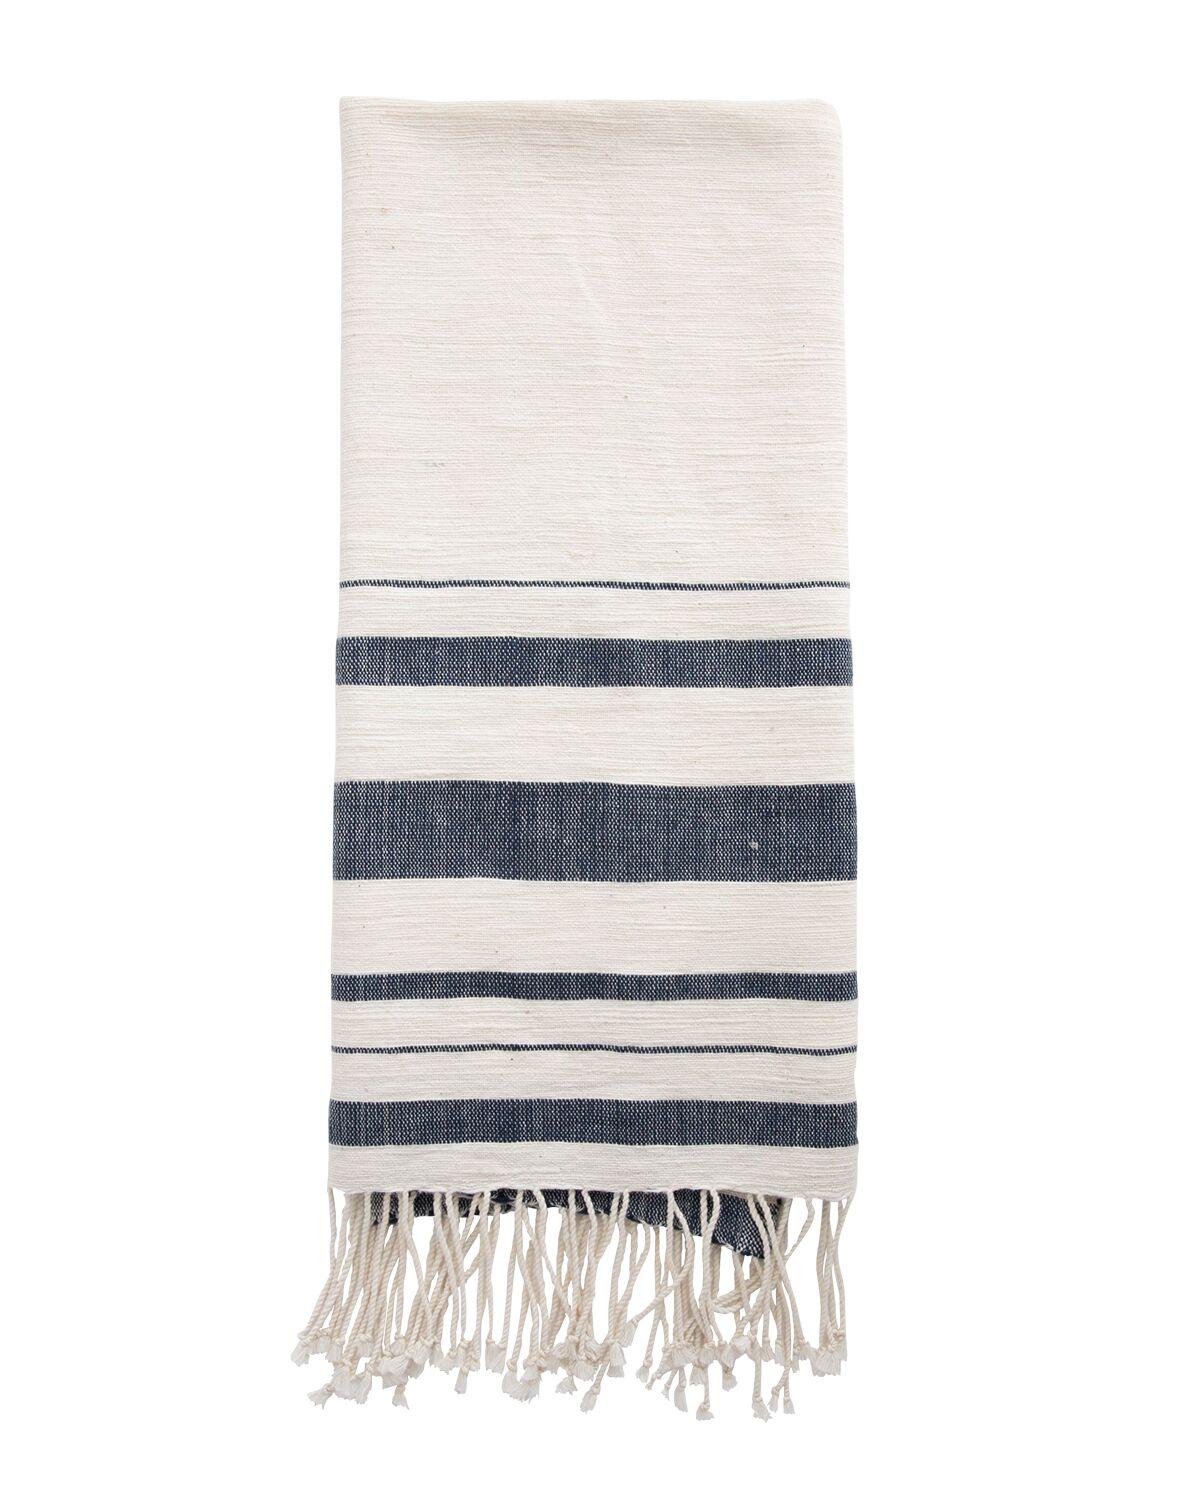 Upton Stripe Hand Towel 1_preview.jpg